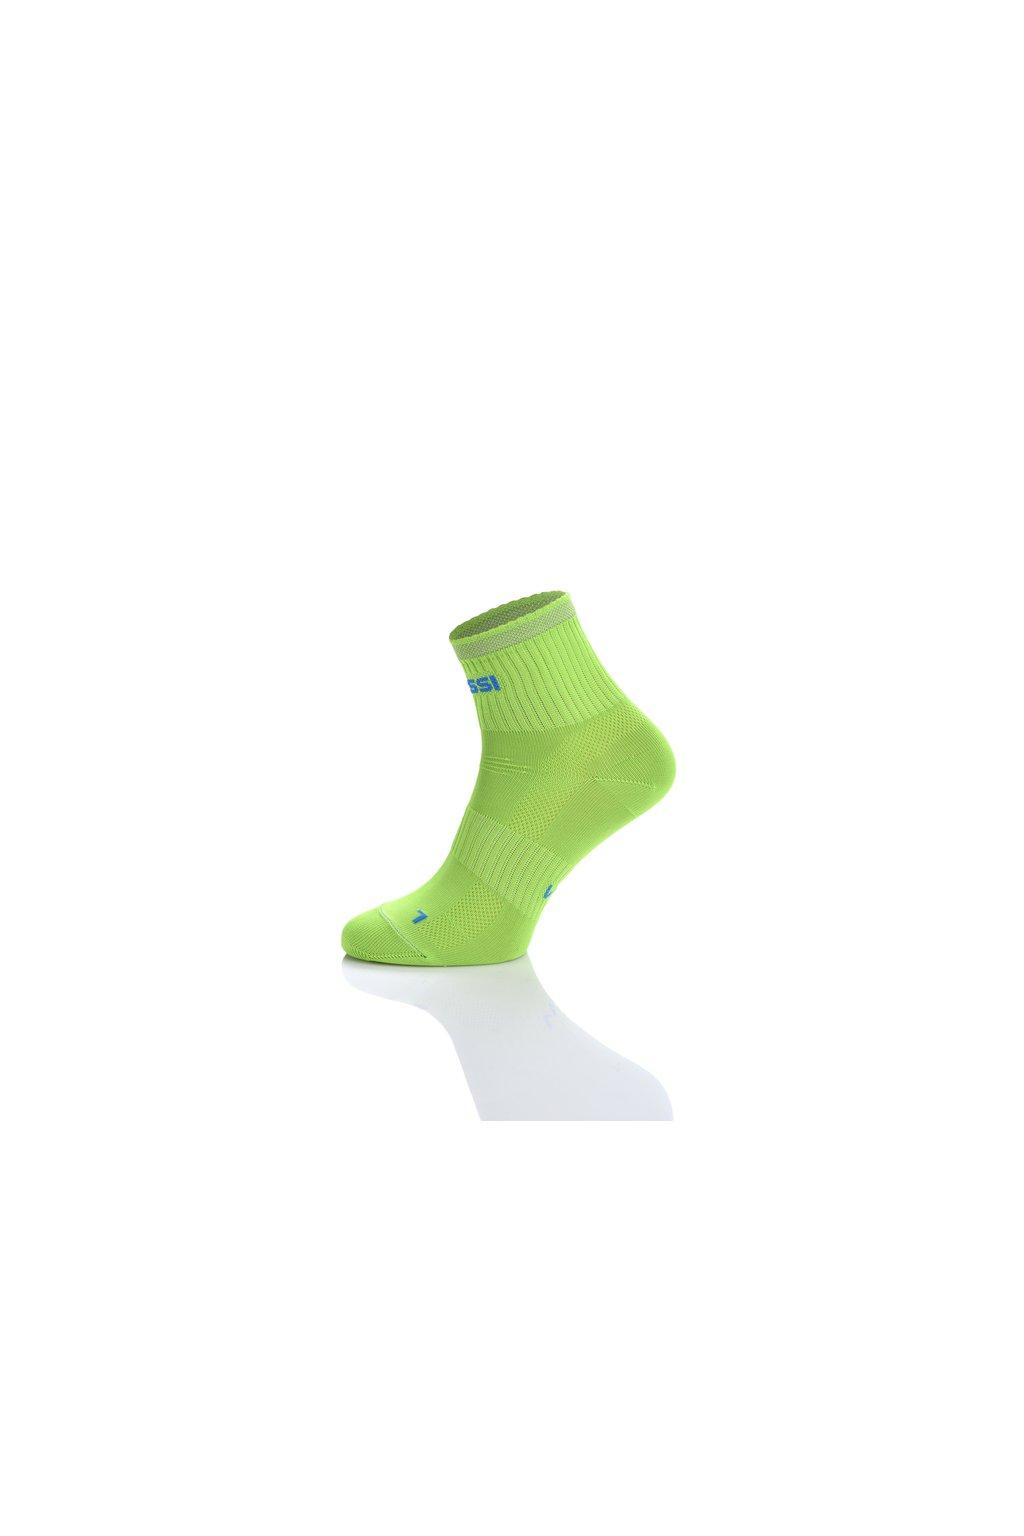 Prodysne ponozky RKKO 4 1